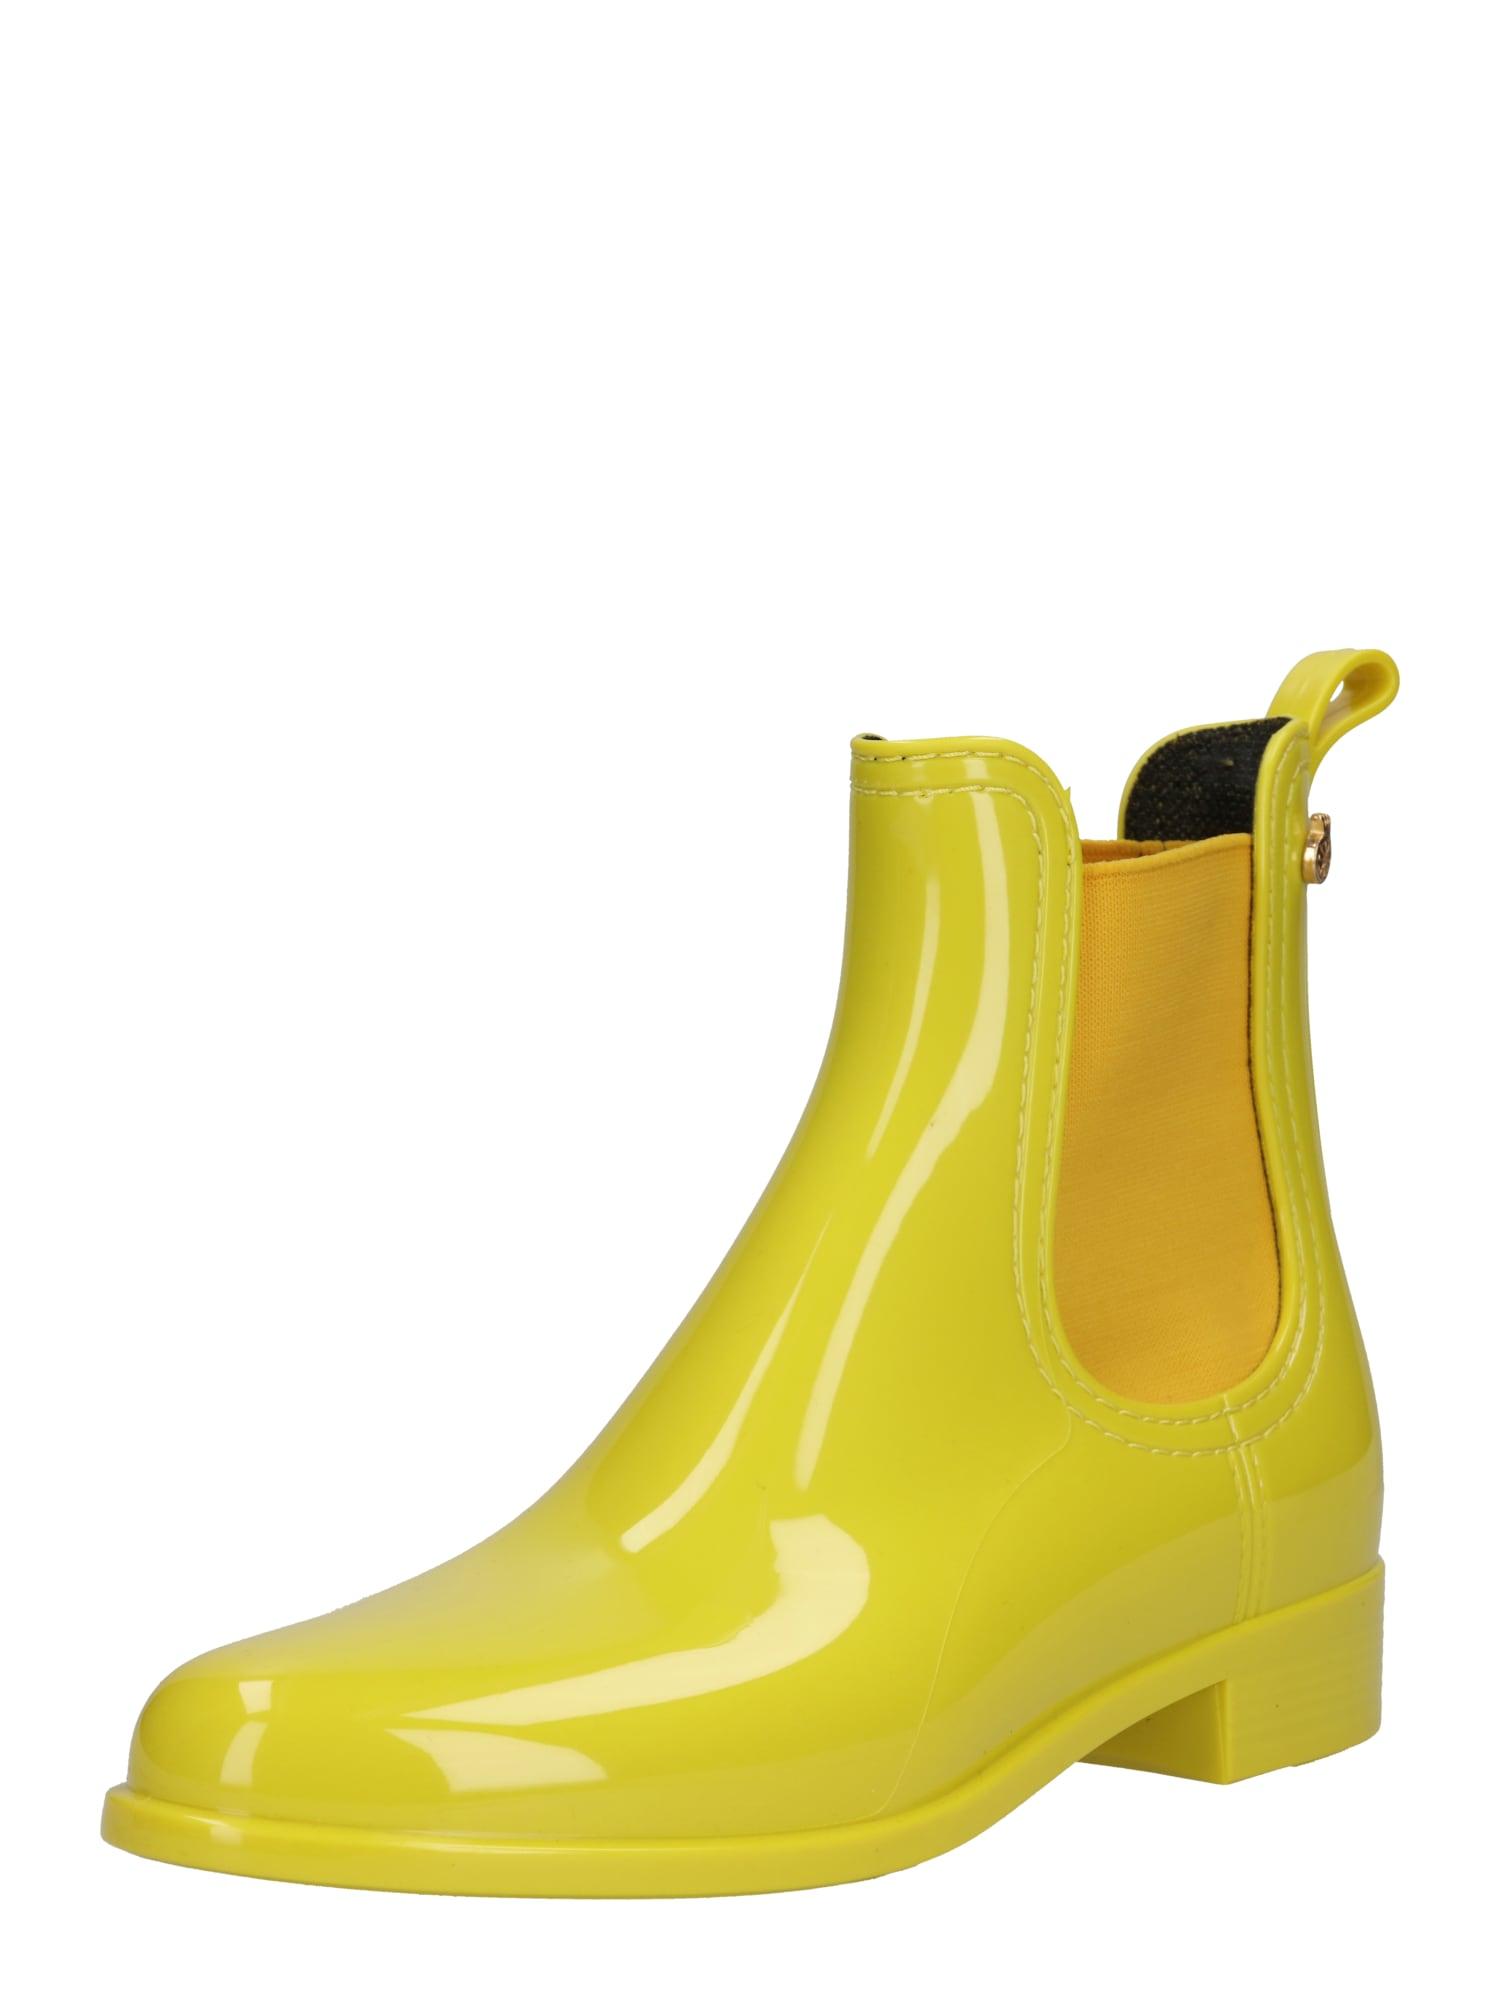 LEMON JELLY Guminiai batai 'Comfy' geltona